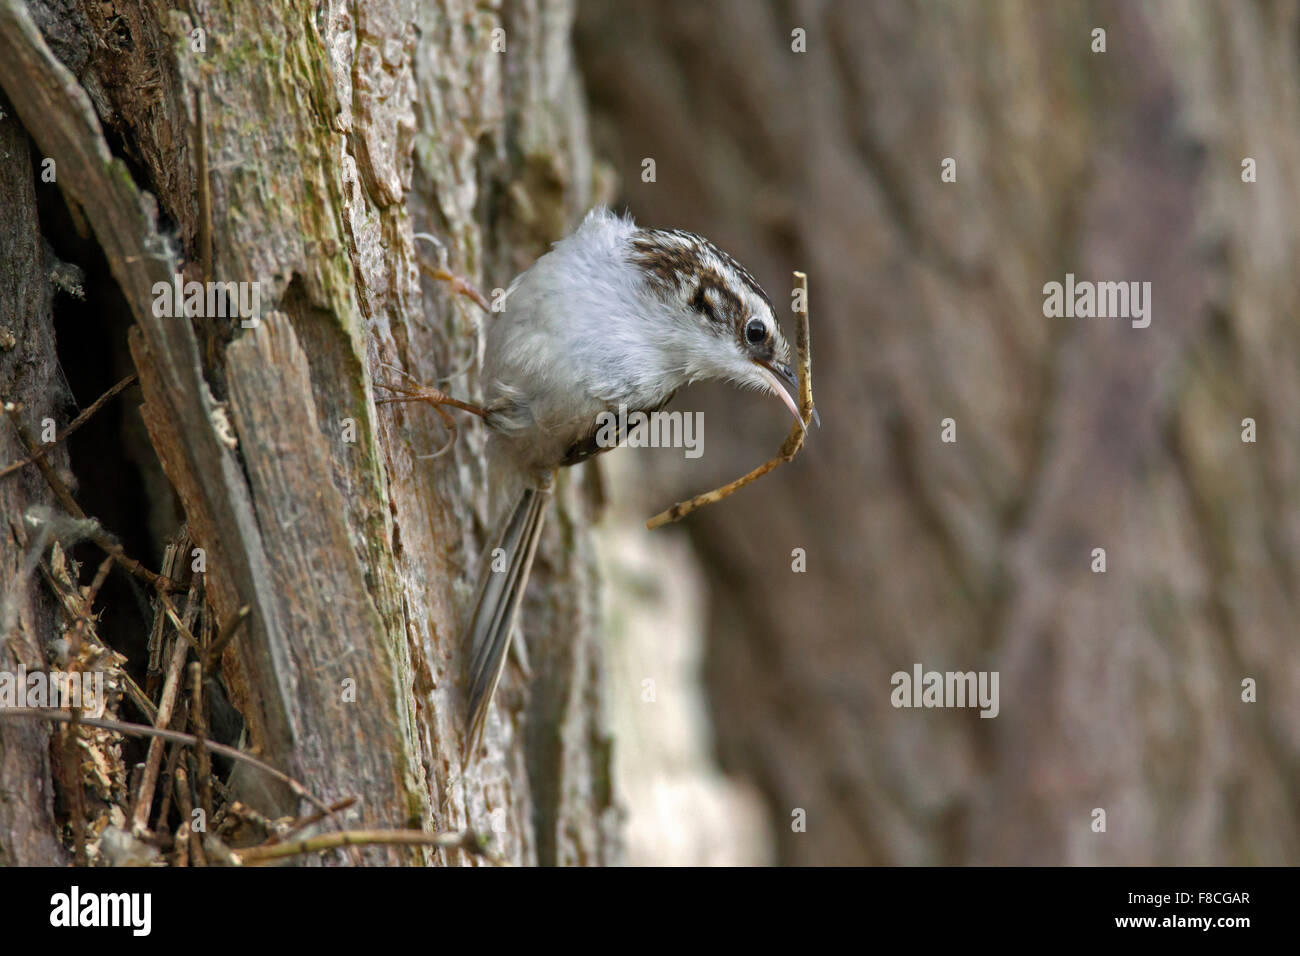 Eurasian treecreeper / common treecreeper (Certhia familiaris) climbing tree trunk with twig as nesting material Stock Photo